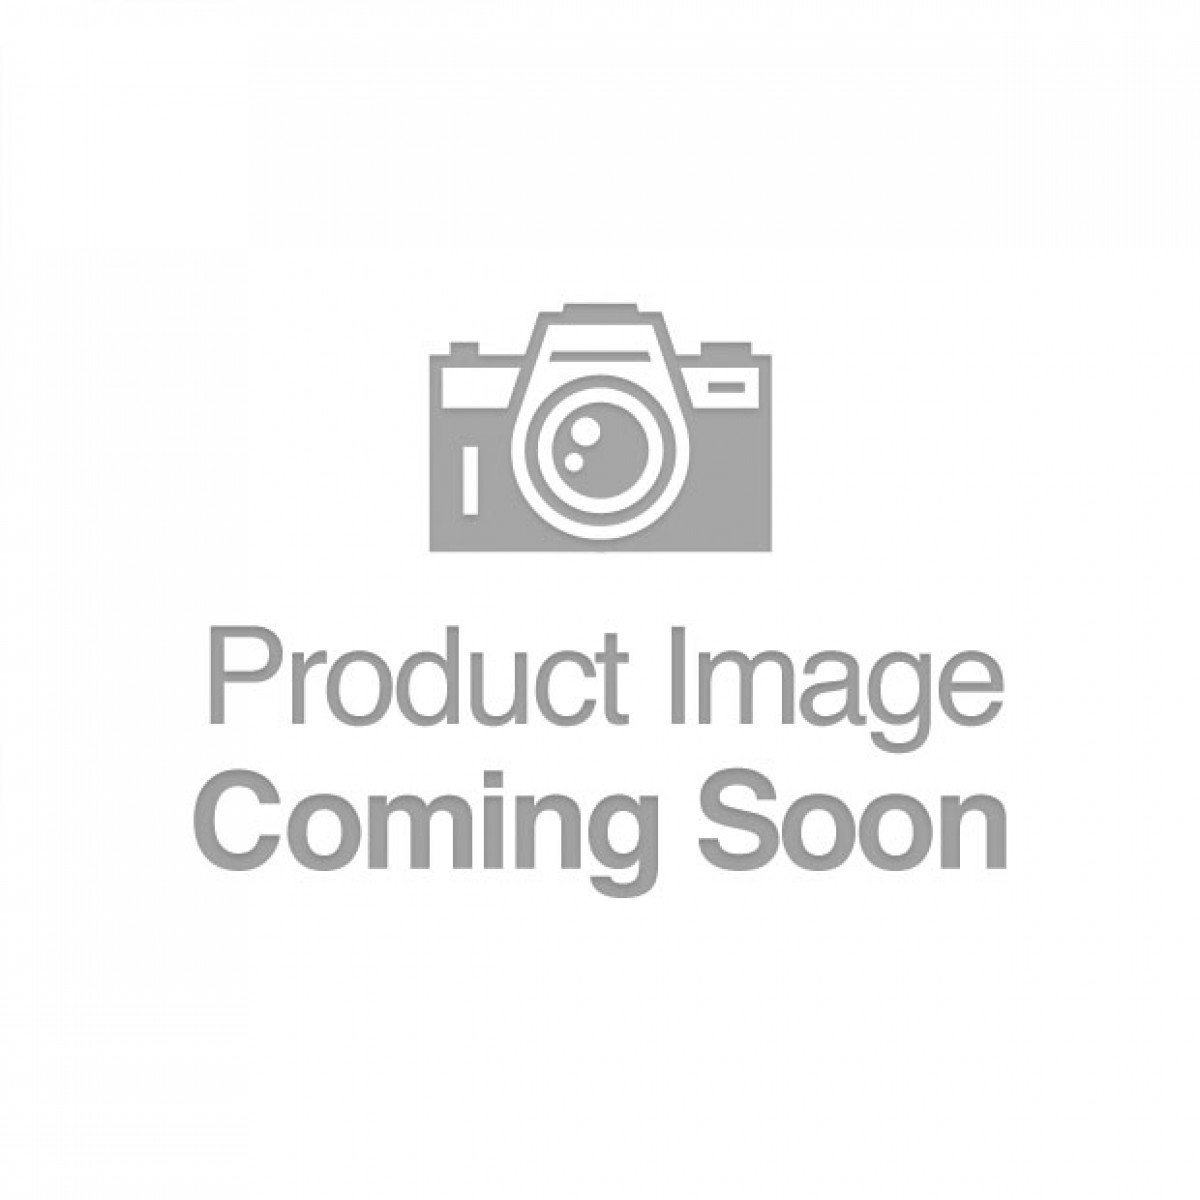 Sensuva Natural Water Based Personal Moisturizer - 4.23 oz Watermelon